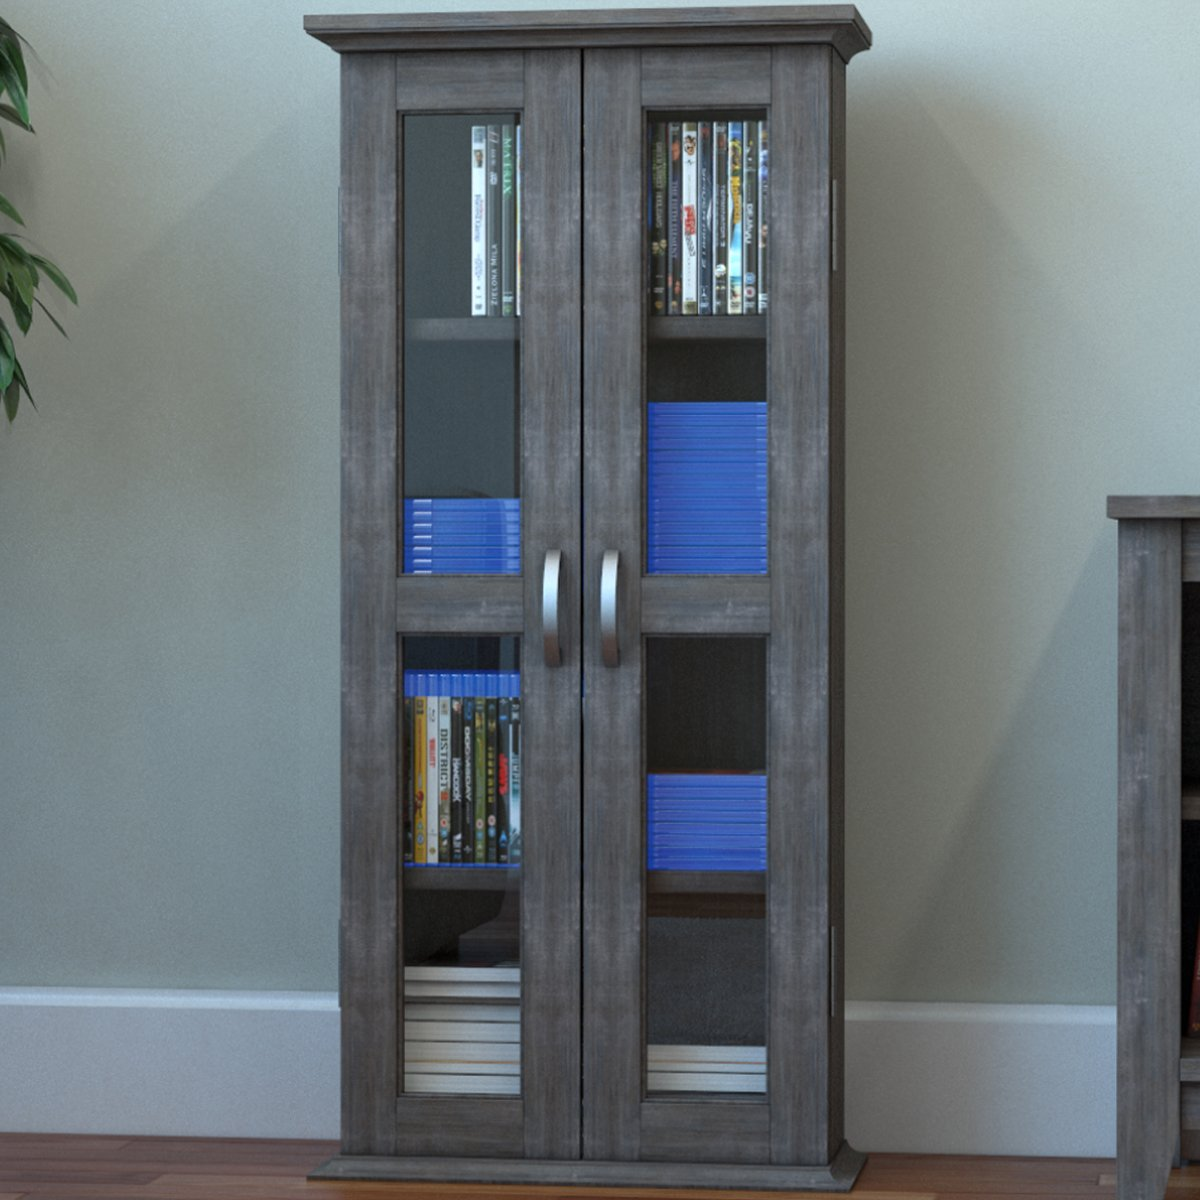 "Ryan Rove Kirkwell 41"" Wood Bookcase Multimedia Organizer Shelf DVD Media Storage Tower with Doors in Ash Grey"